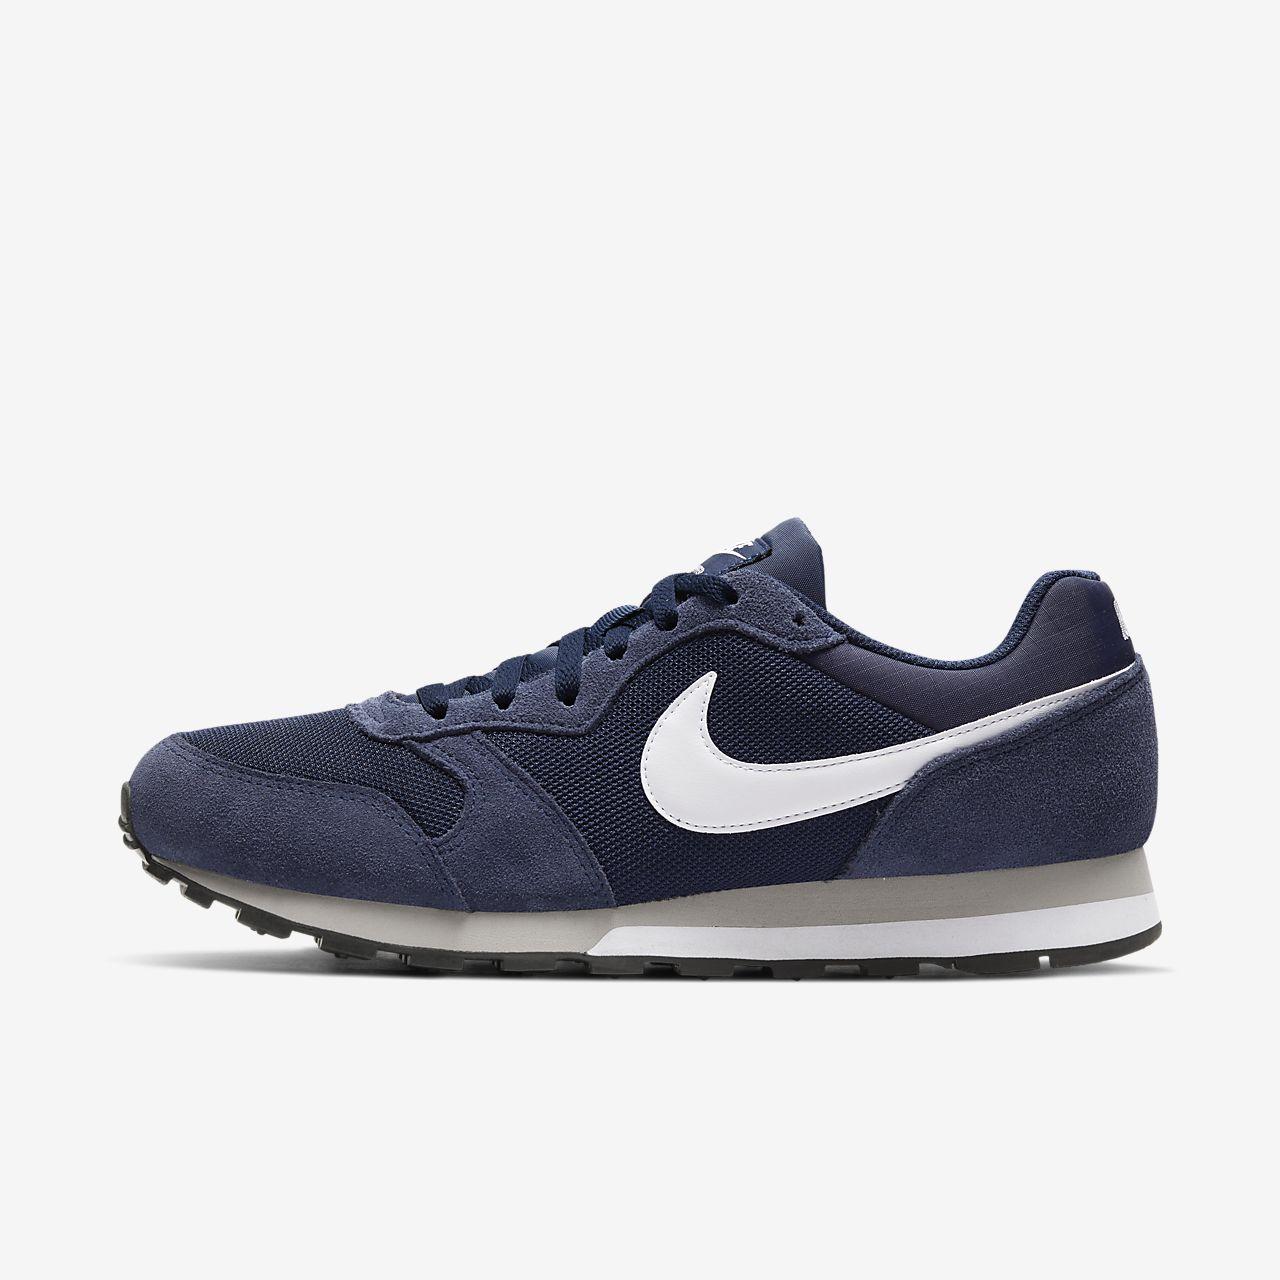 Low Resolution Scarpa runner Nike MD Runner 2 - Uomo Scarpa runner Nike MD  Runner 2 - Uomo 900f147451e